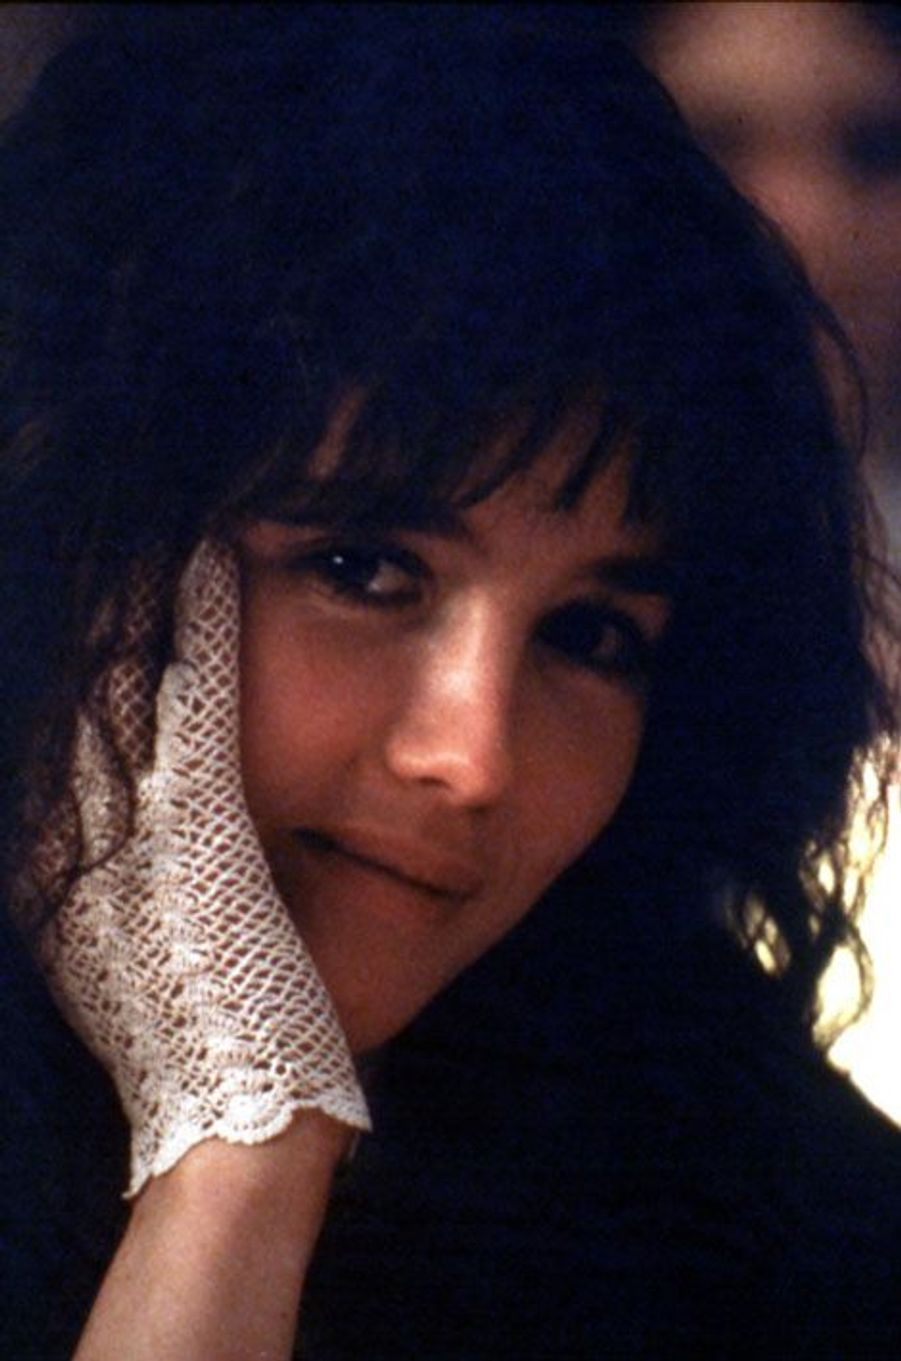 Isabelle Adjani - Ishtar (1987)